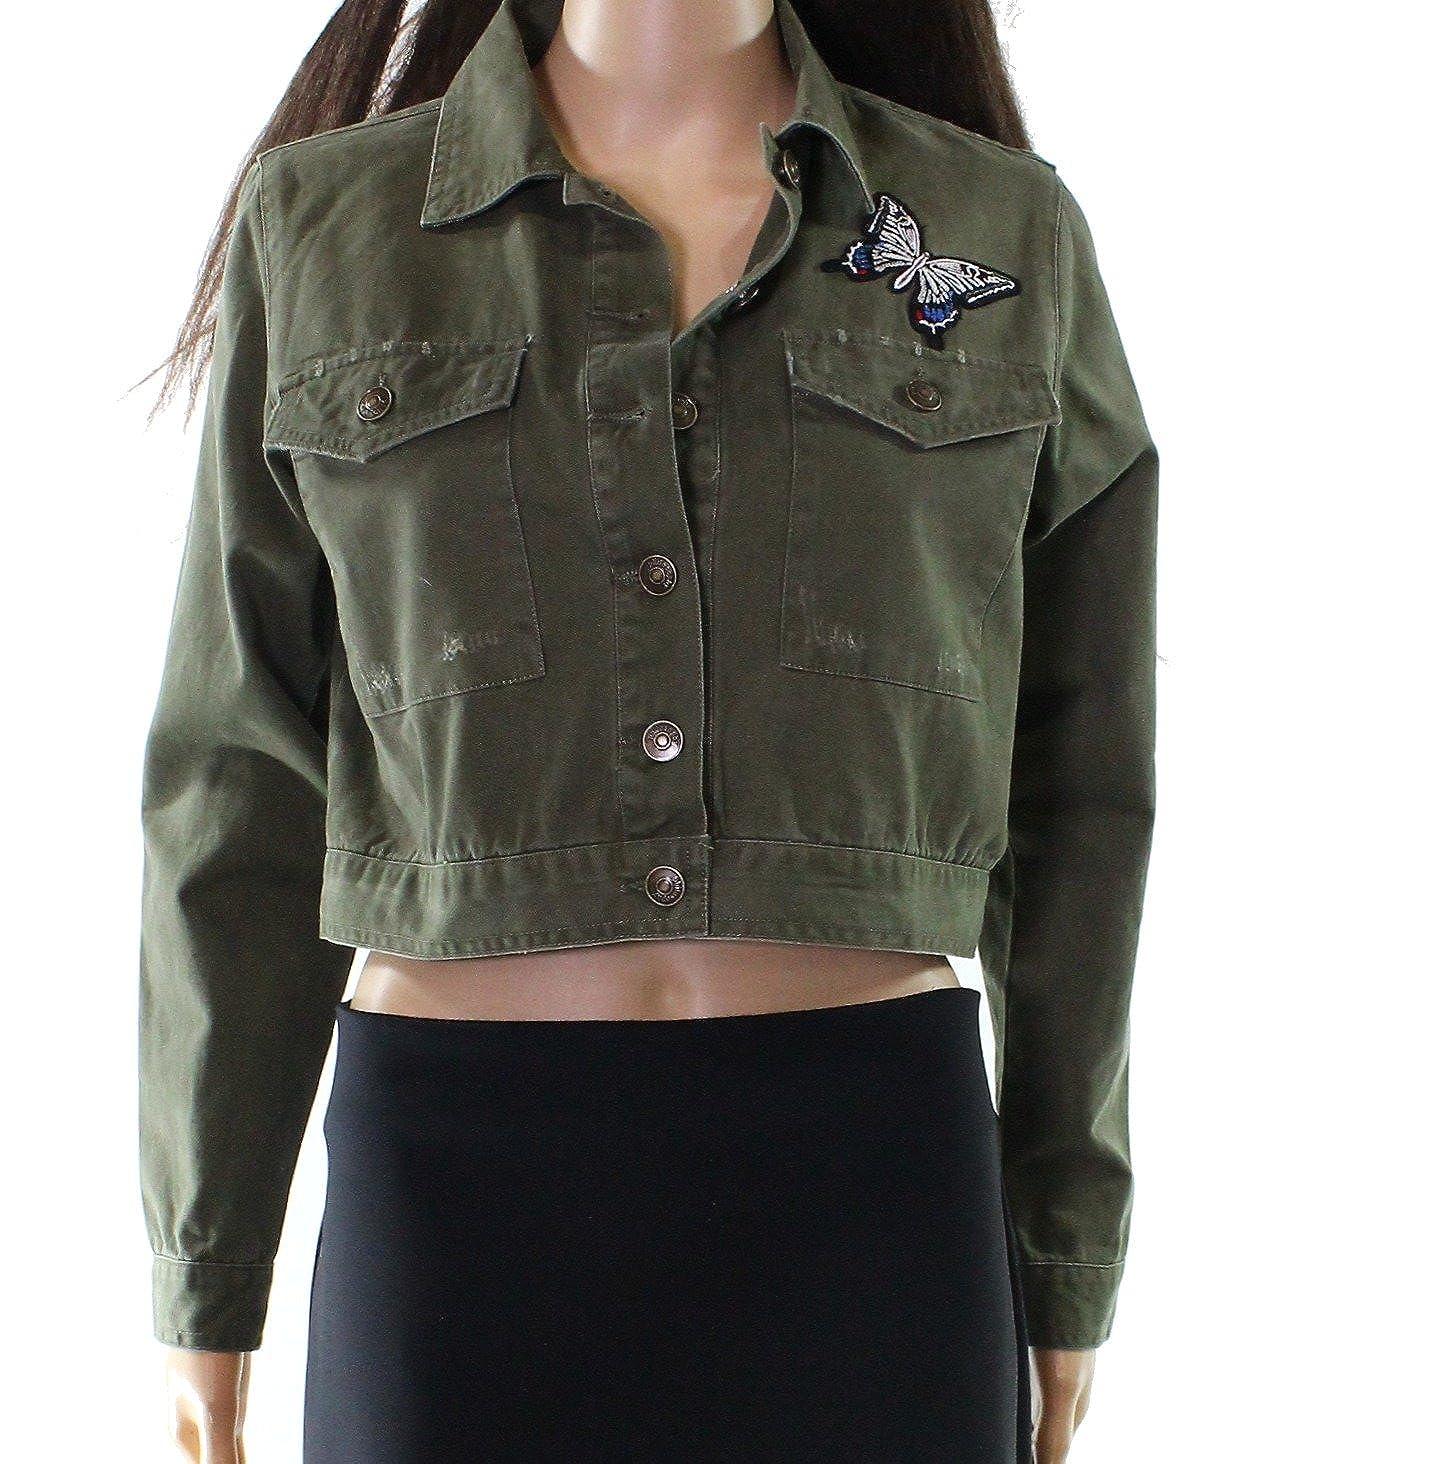 d57b701ff Top11: Philosophy Womens Medium Butterfly Embroidered Denim Jacket